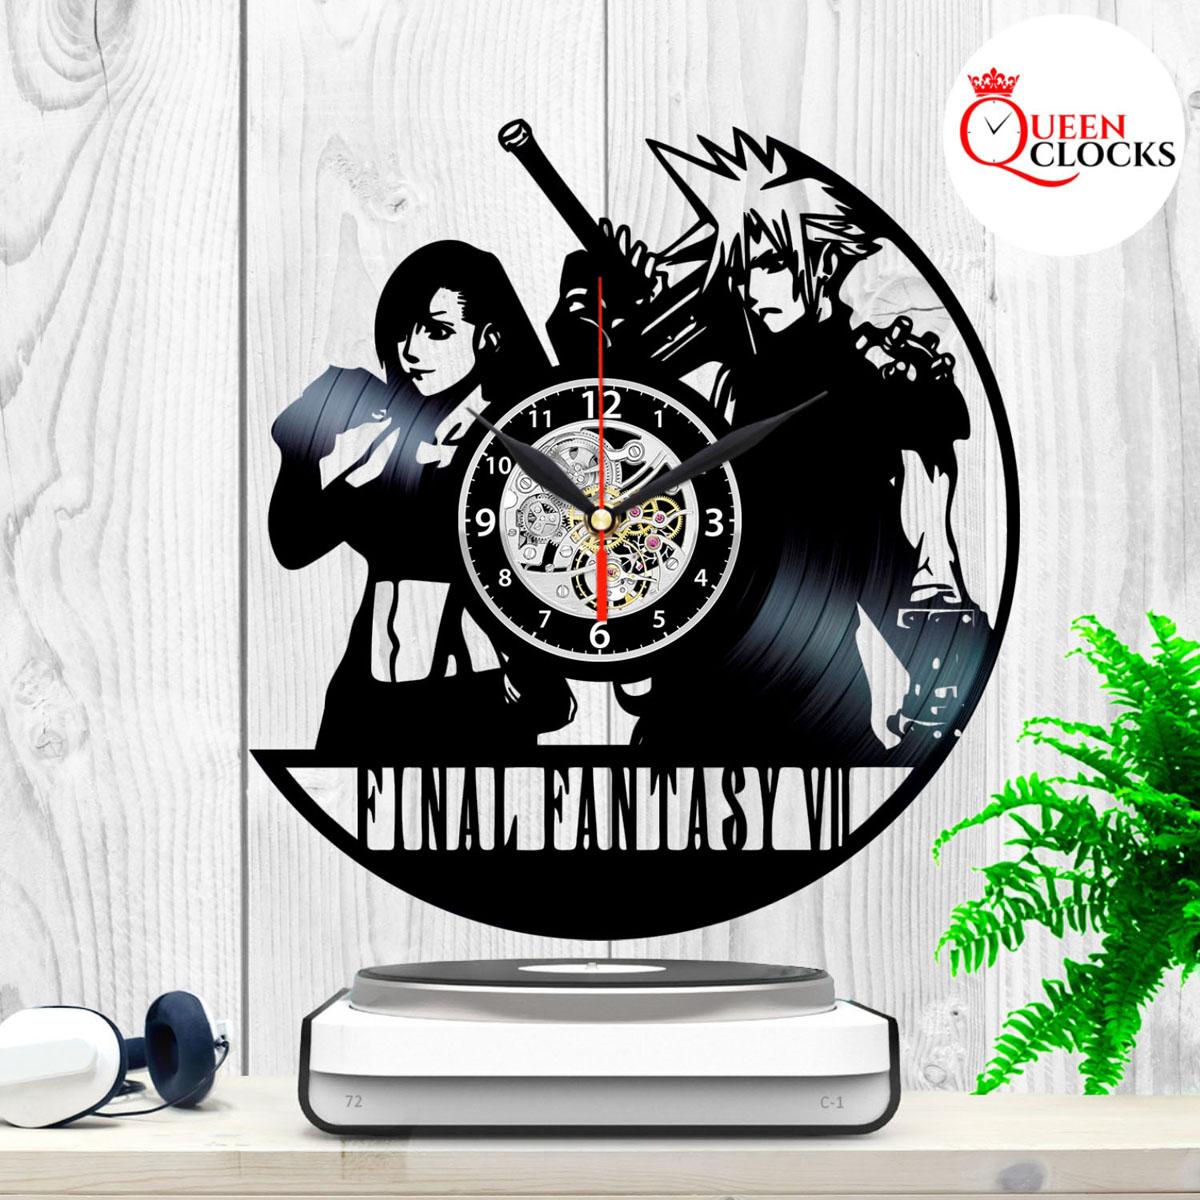 Final Fantasy Vii 7 Sephiroth Cloud Vinyl Record Wall